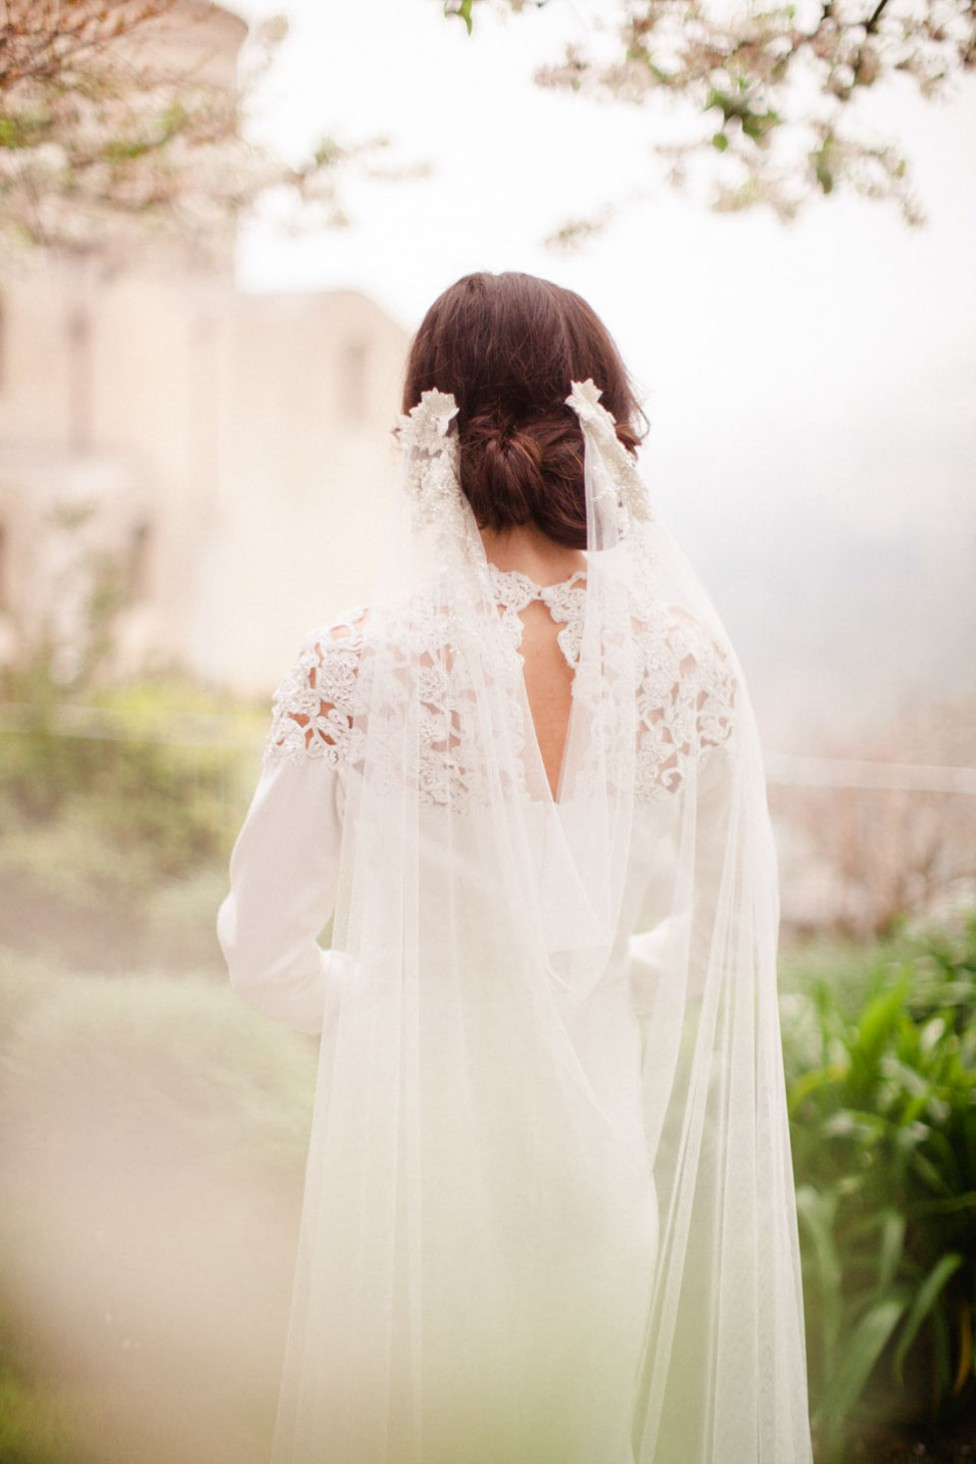 Vorgemerkt: Moda e Arte Workshop an der Amalfiküste Oktober 2014